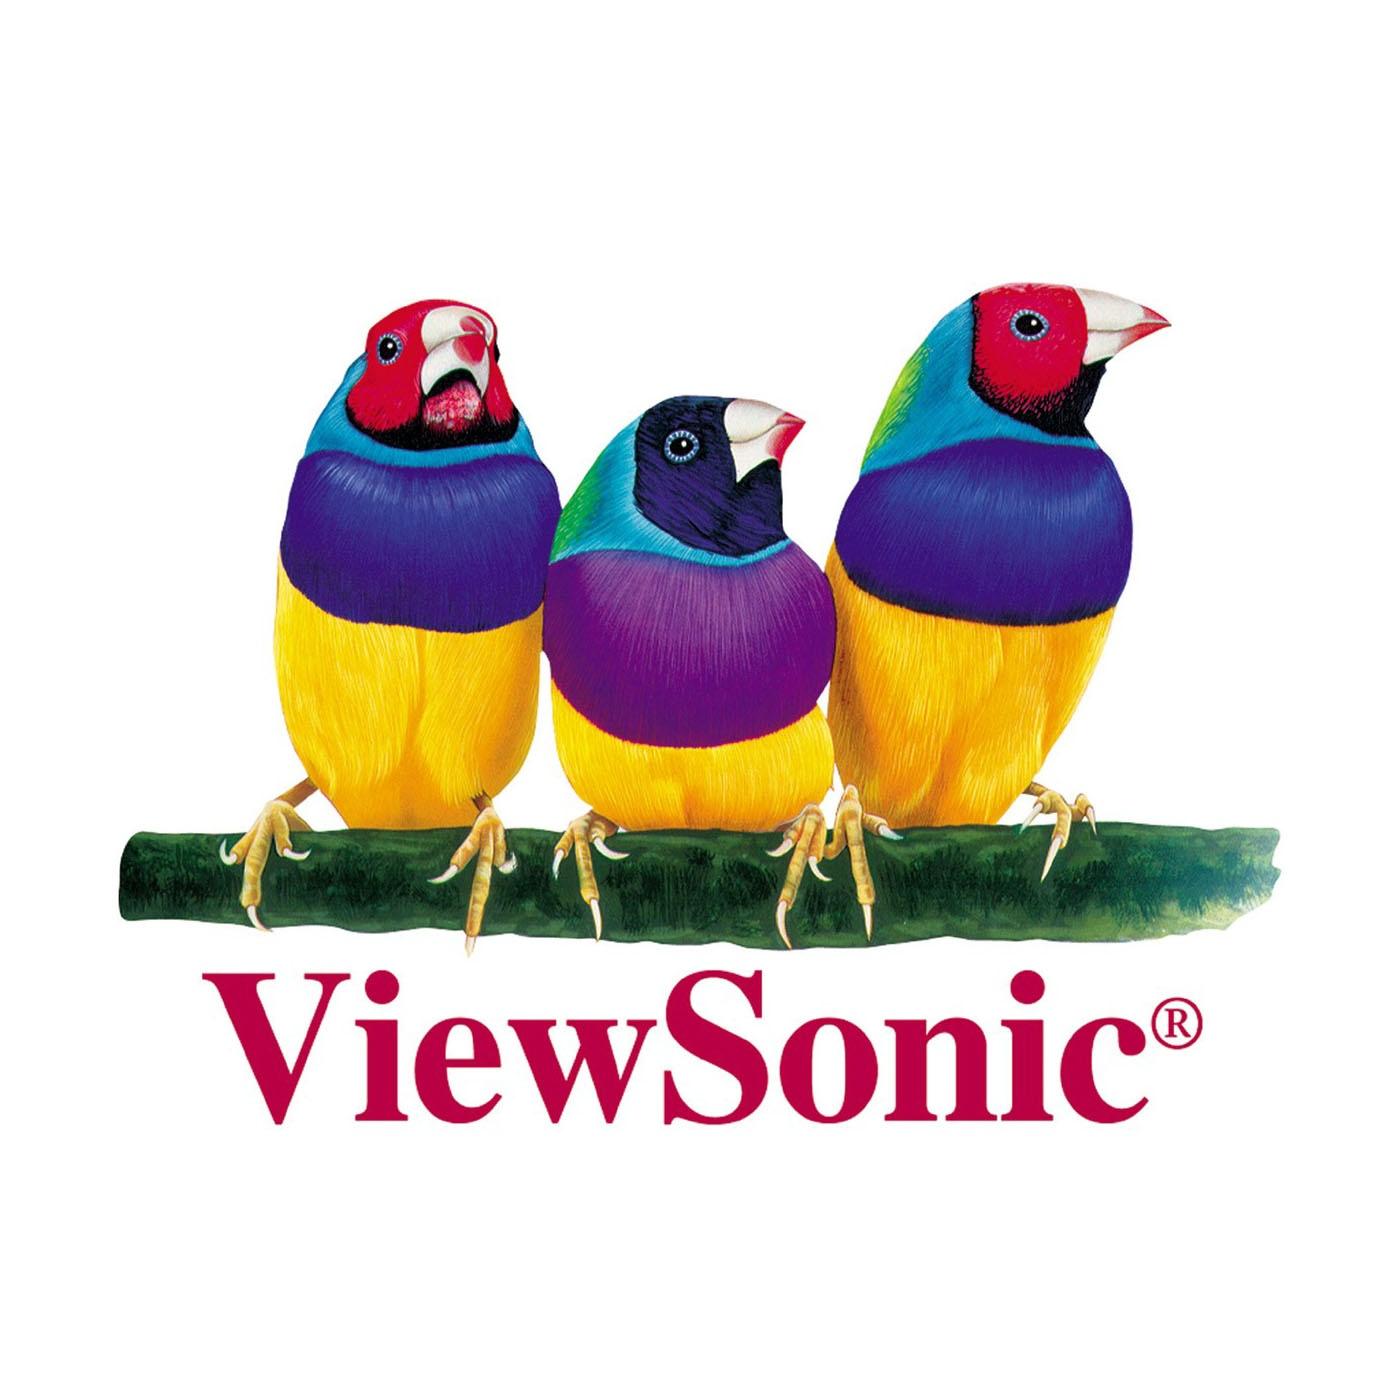 https://0201.nccdn.net/4_2/000/000/00d/f43/1400x1400xviewsonic-logo2.jpg.pagespeed.ic.SStkE3qdw7-1400x1400.jpg